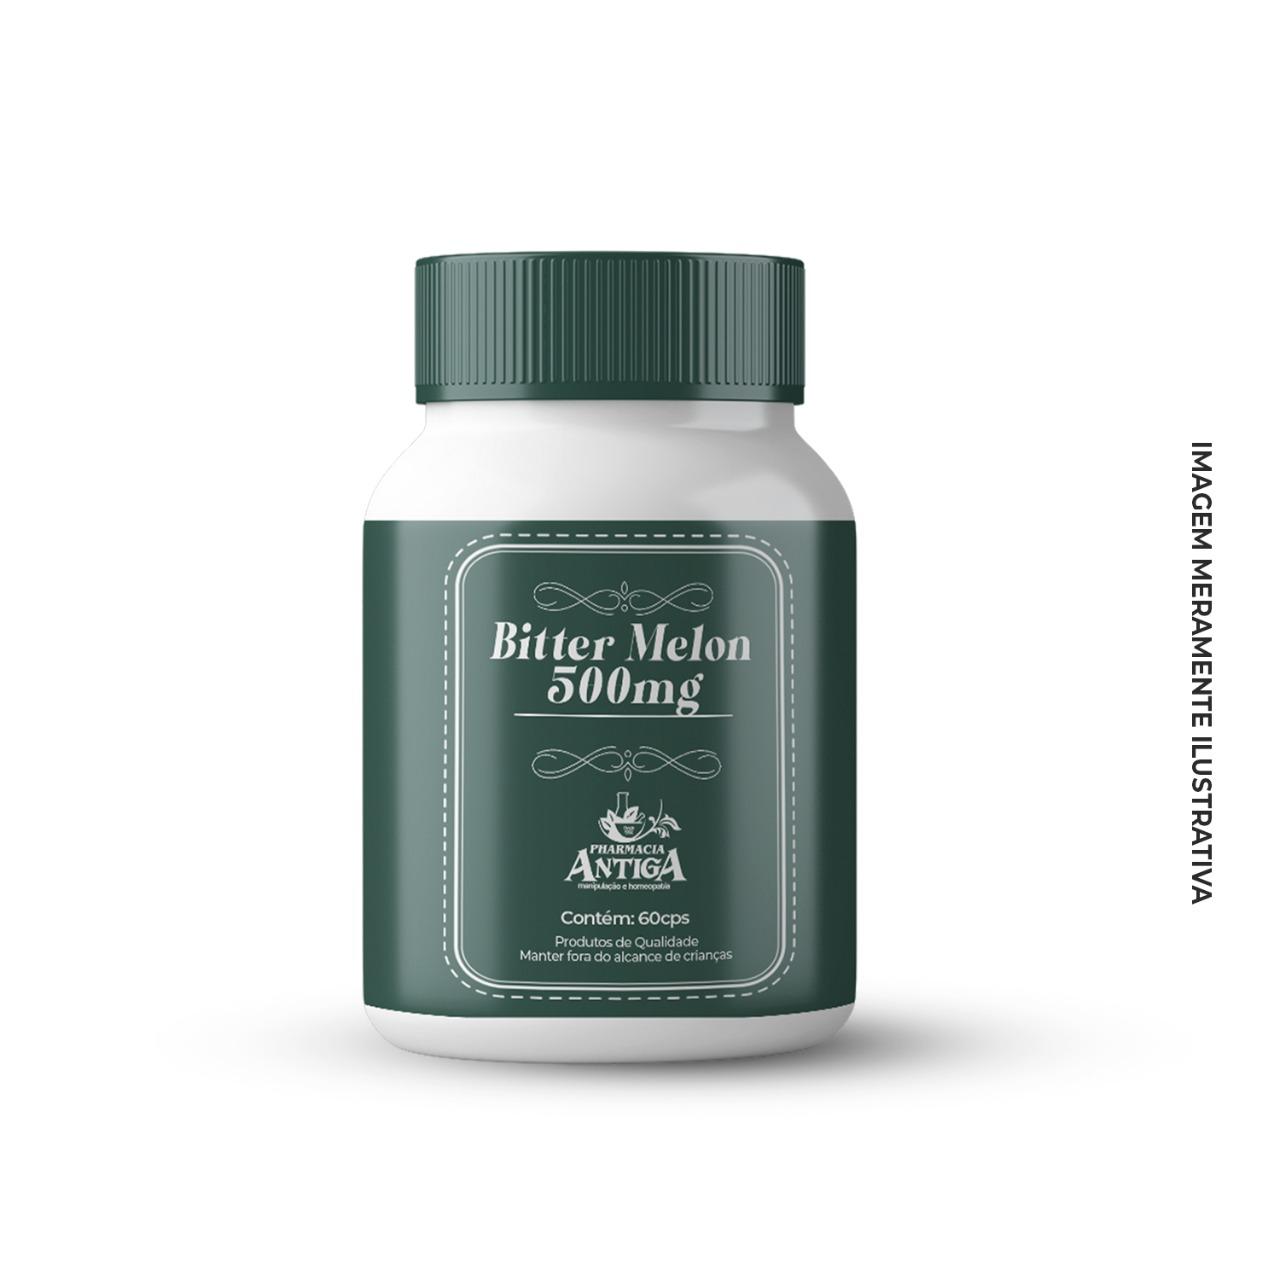 Bitter melon 500 mg 60 cps